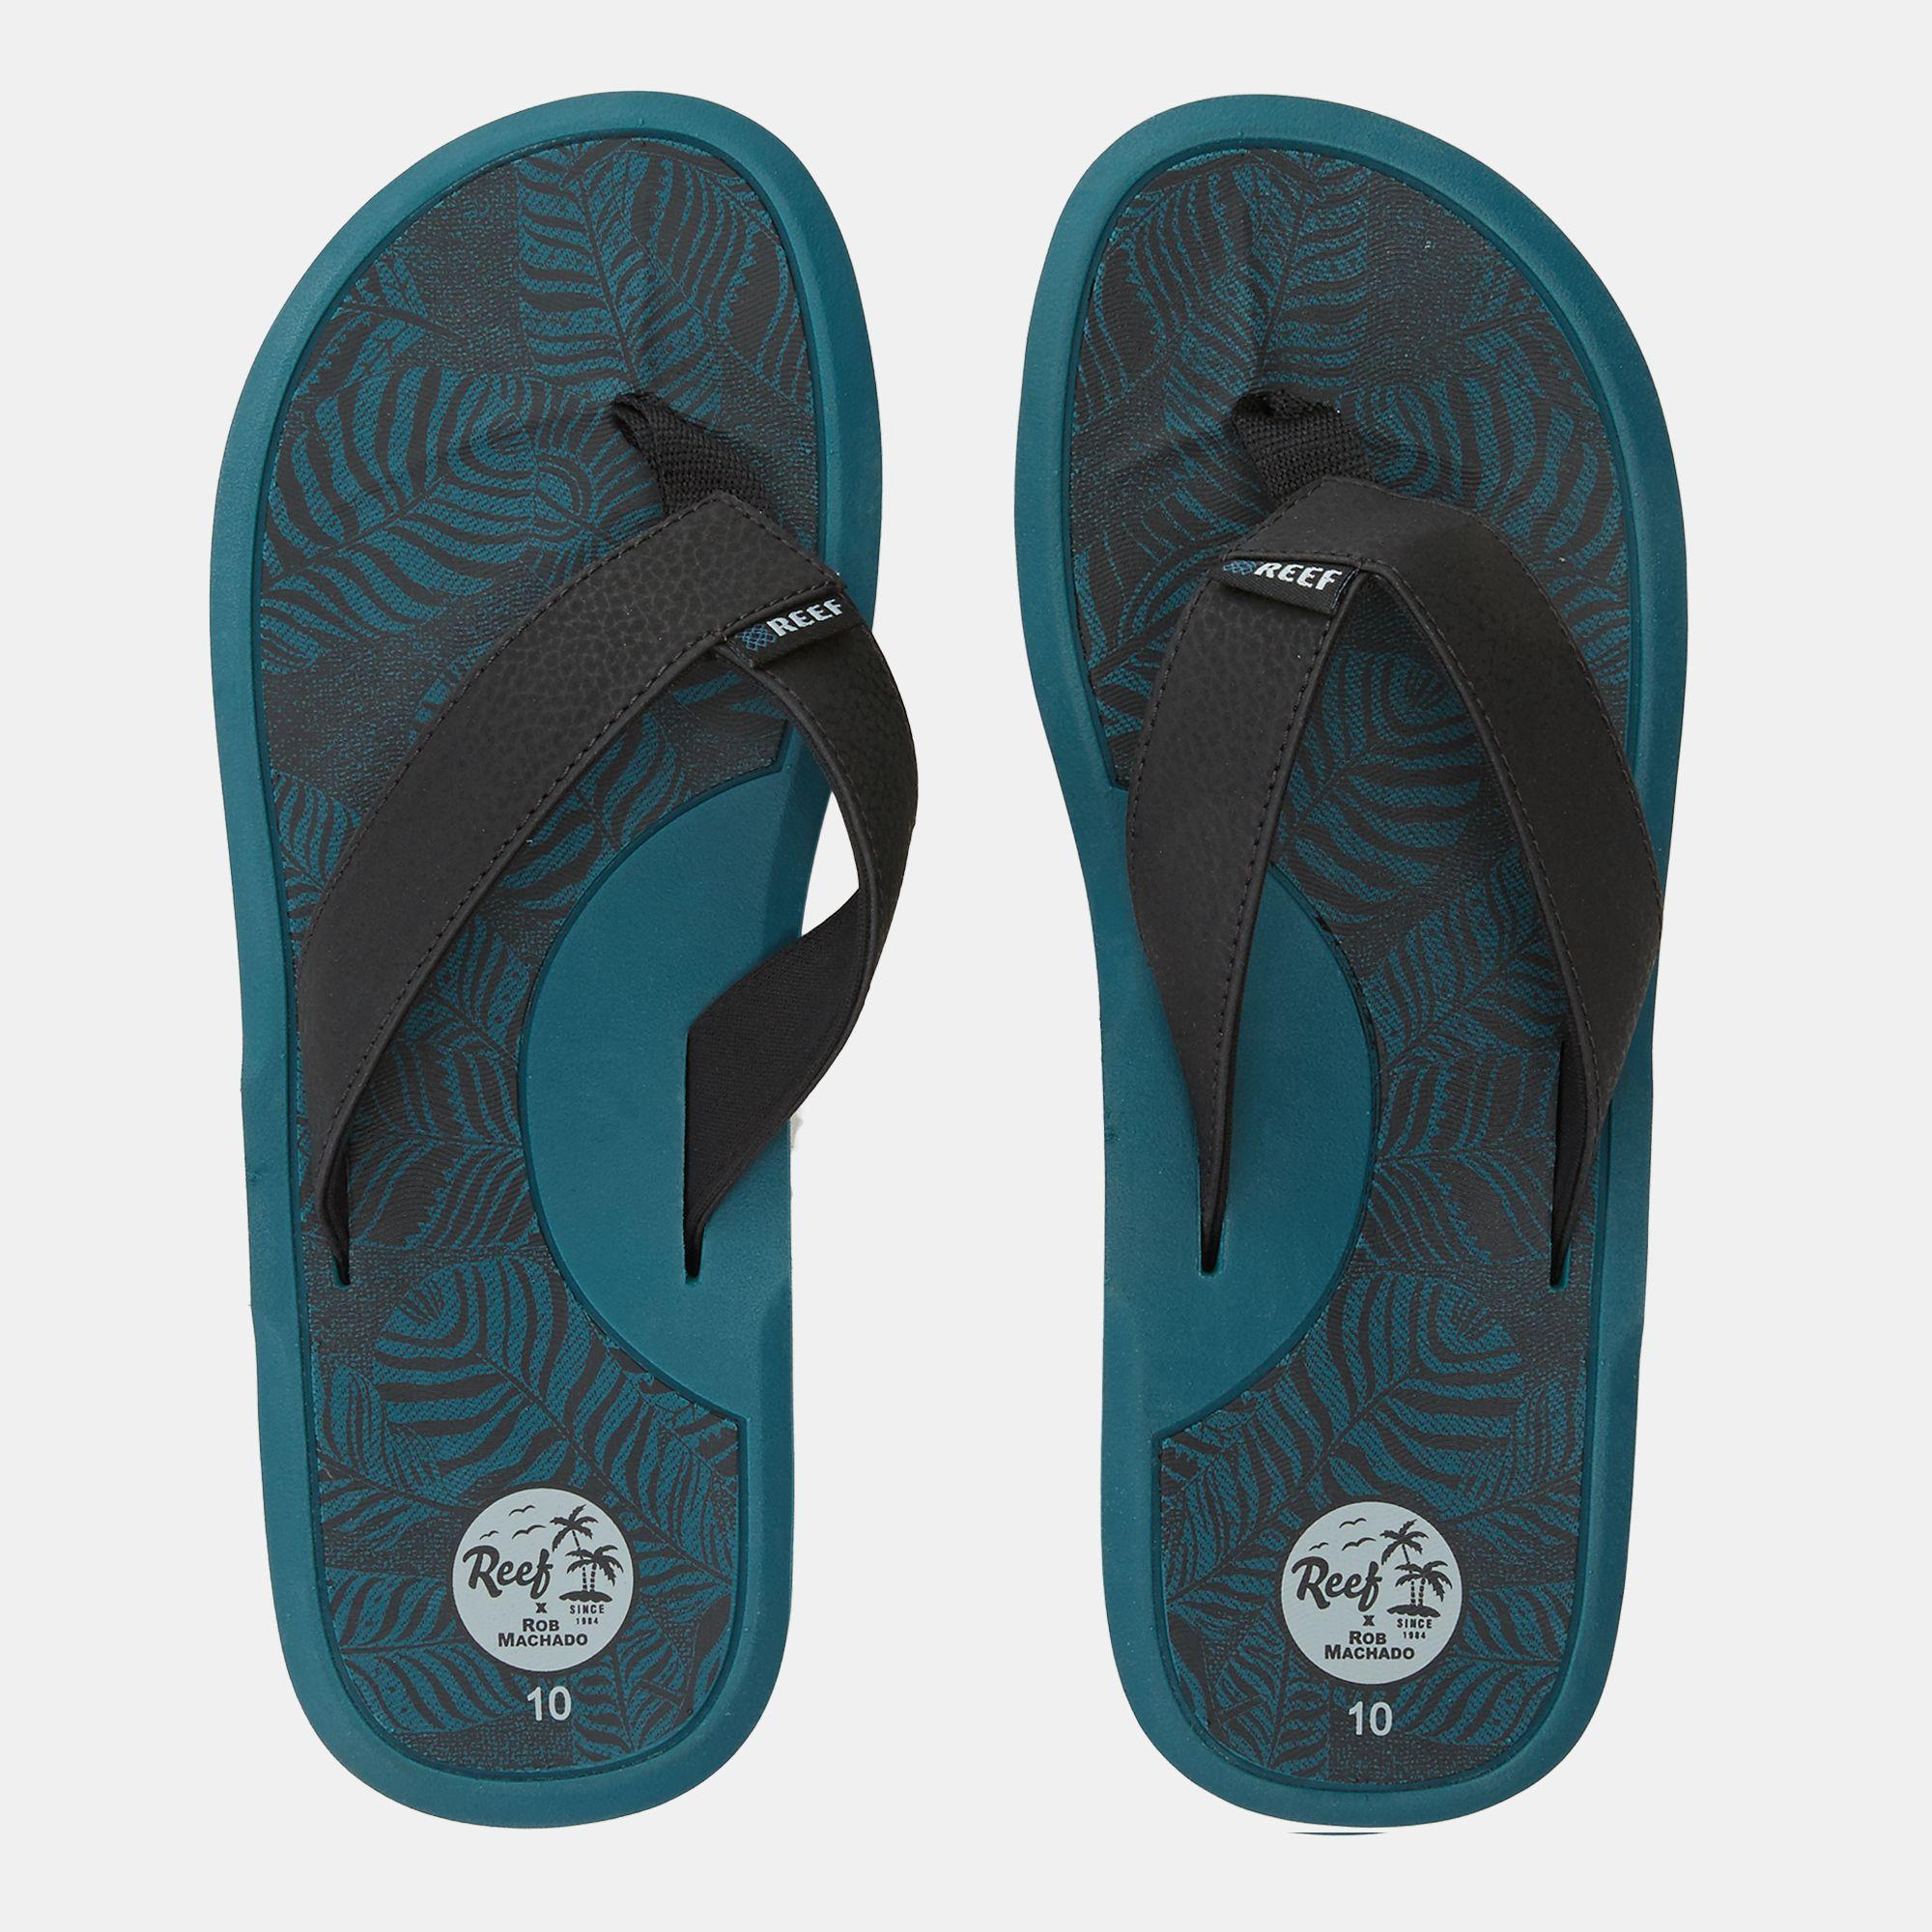 52a5f462269b Reef Machado Day Prints Sandals